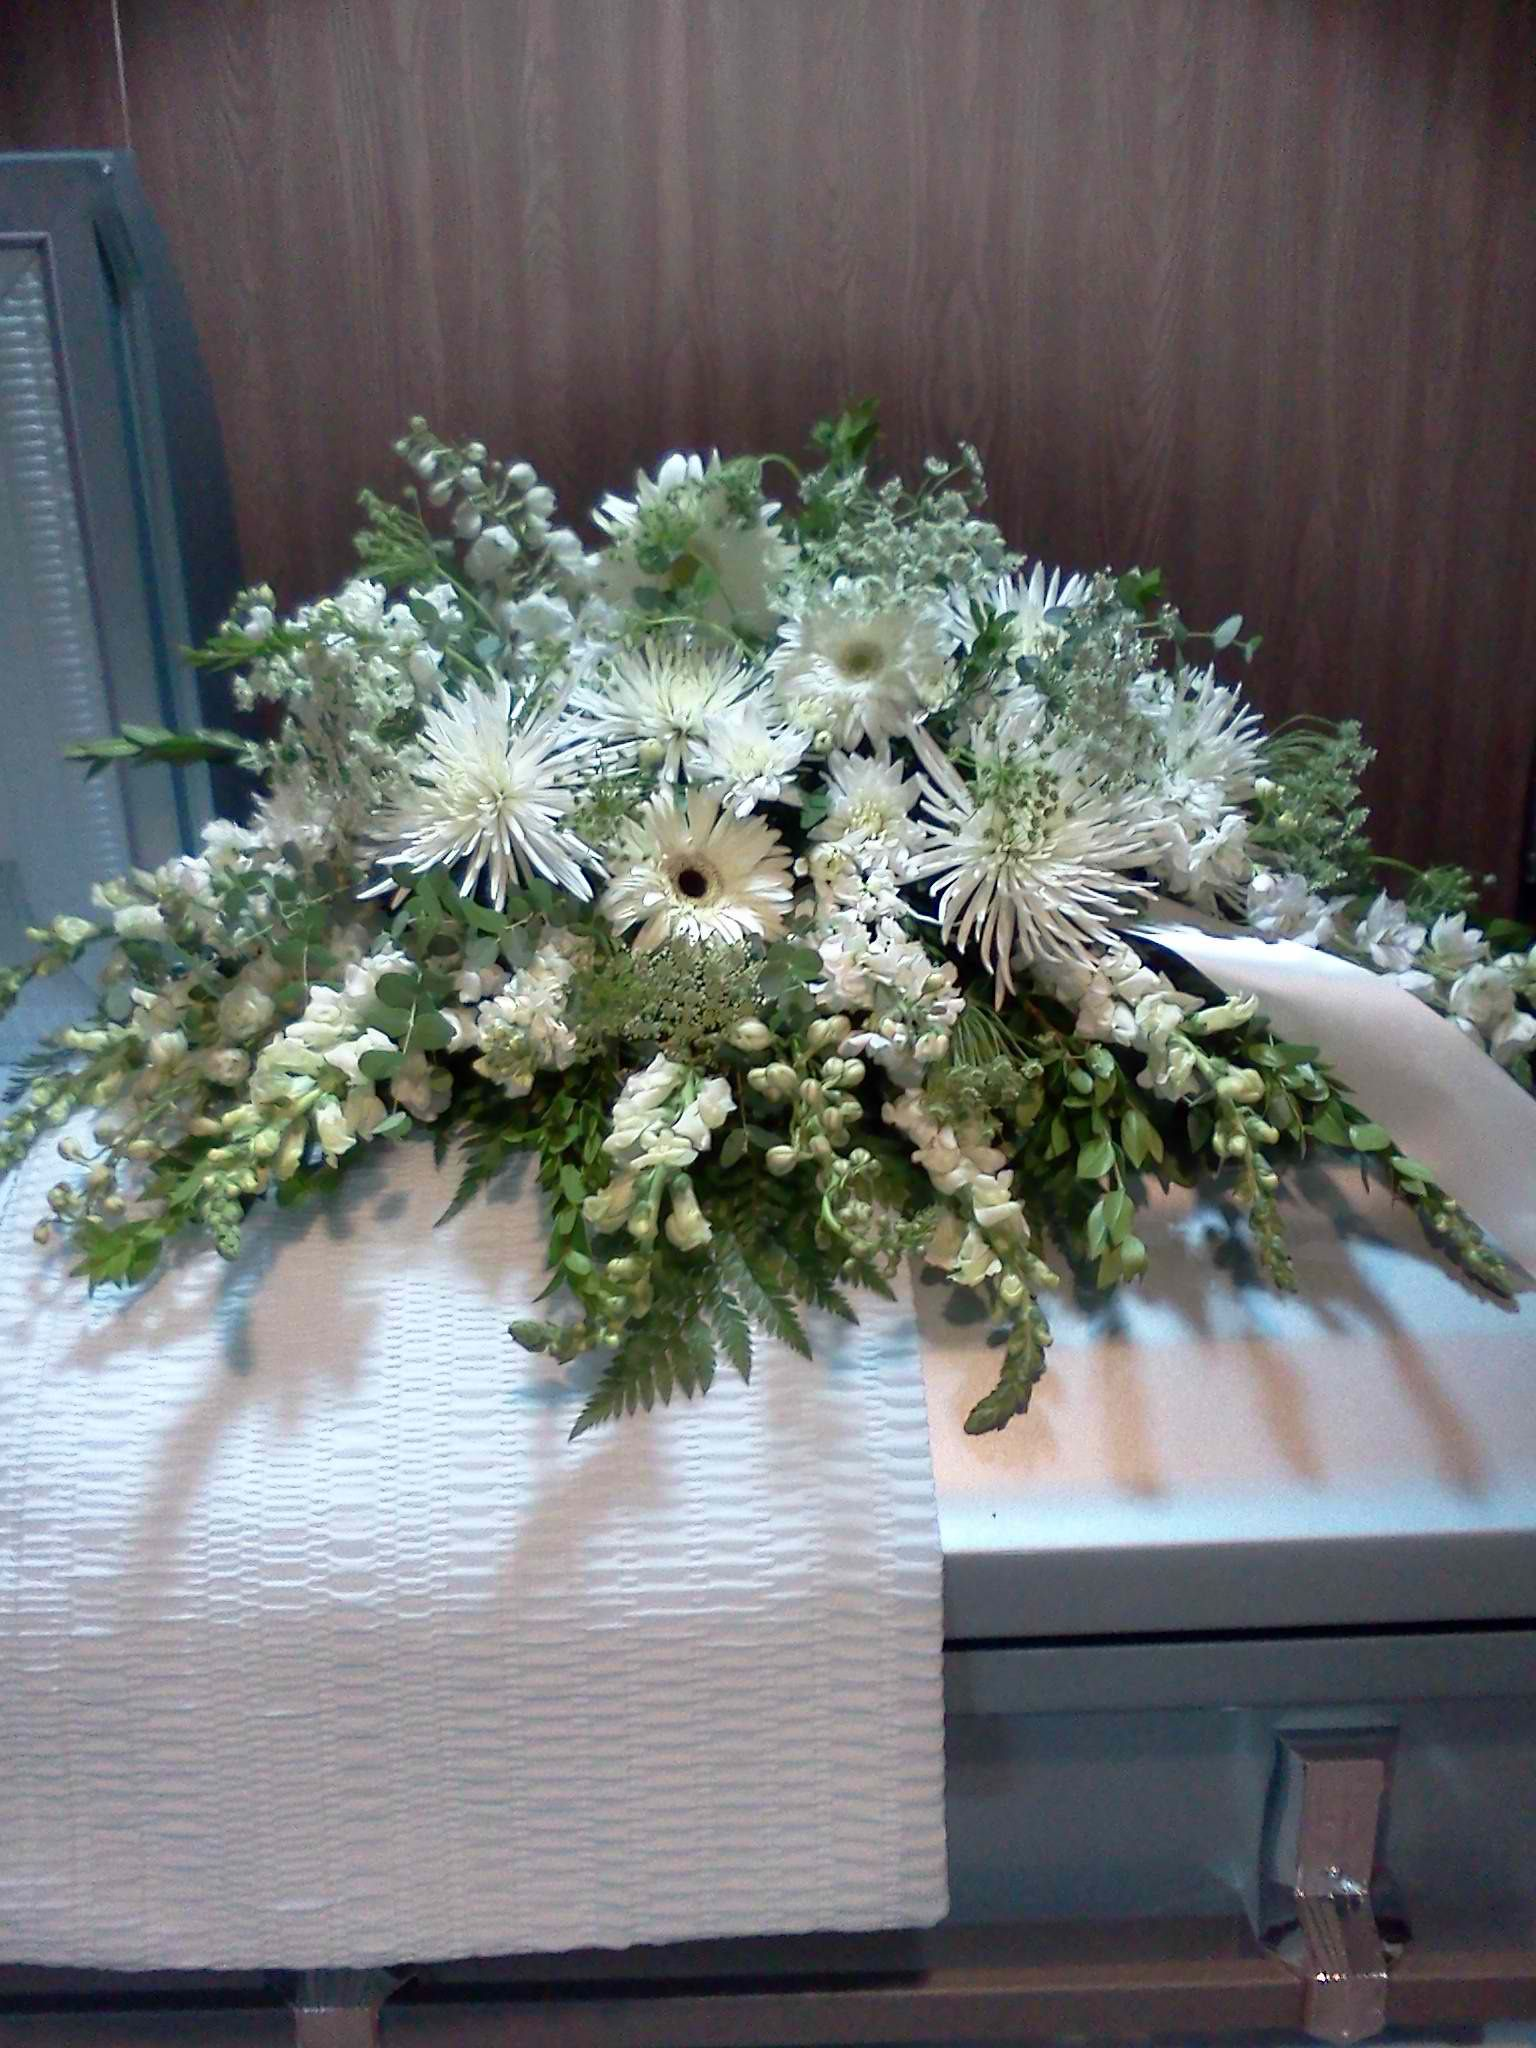 White casket spray the gerbers daisy florist boutique white casket spray funeral bouquet funeral flowers casket flowers funeral caskets funeral izmirmasajfo